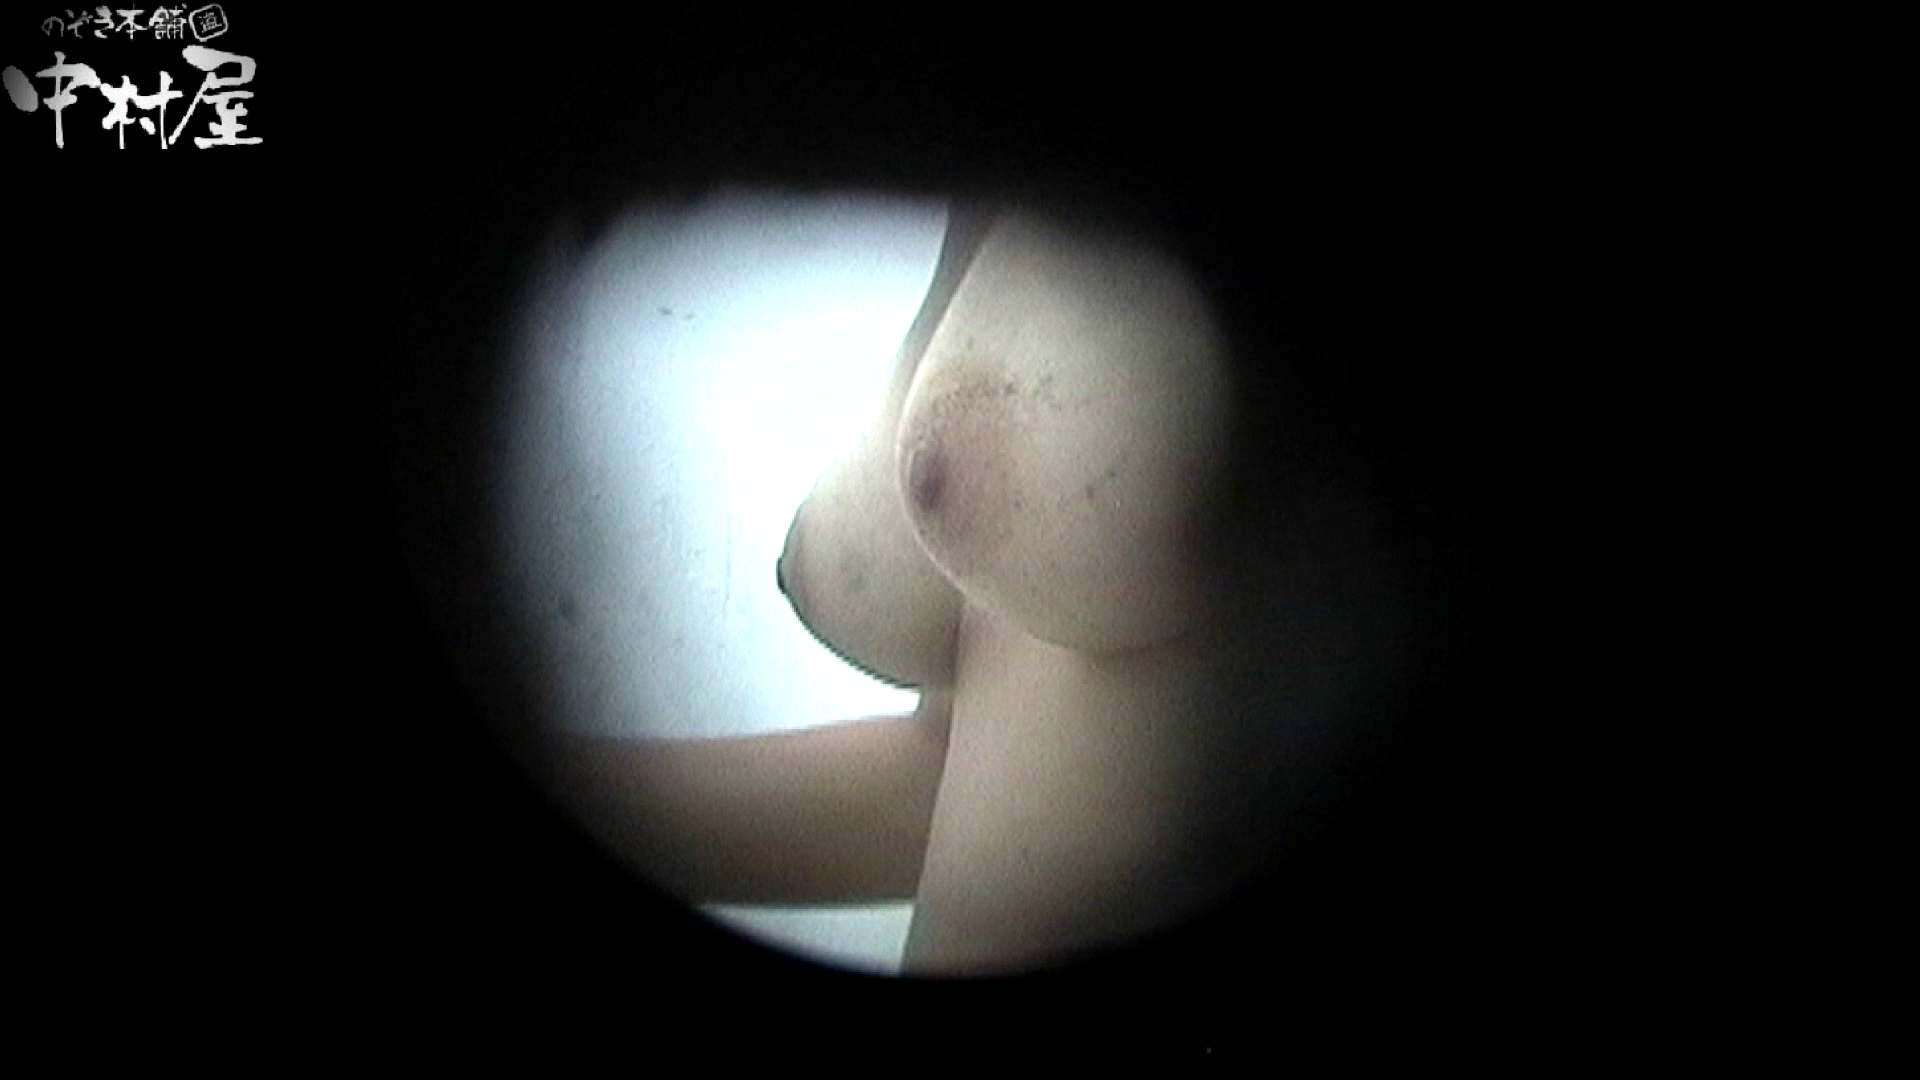 No.46 マシュマロ巨乳が目の前でプルプル 巨乳 おめこ無修正画像 78連発 31